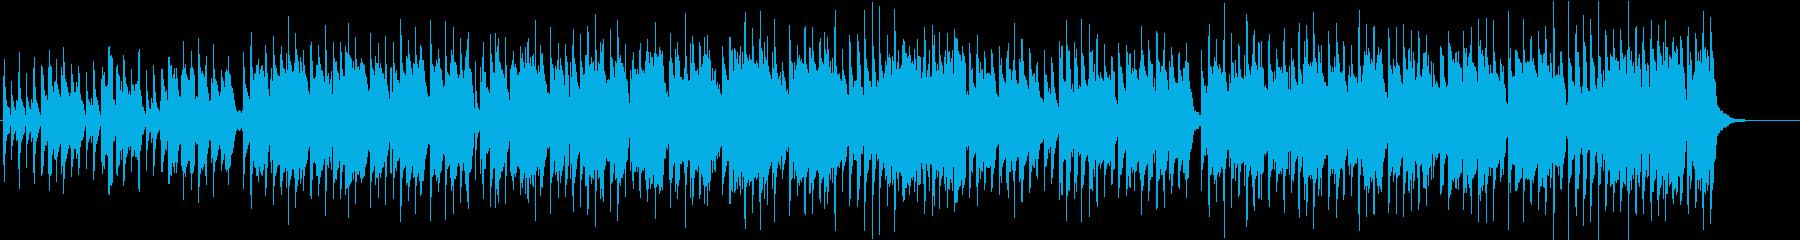 CM用10A、陽気で可愛いキッズ・ペットの再生済みの波形